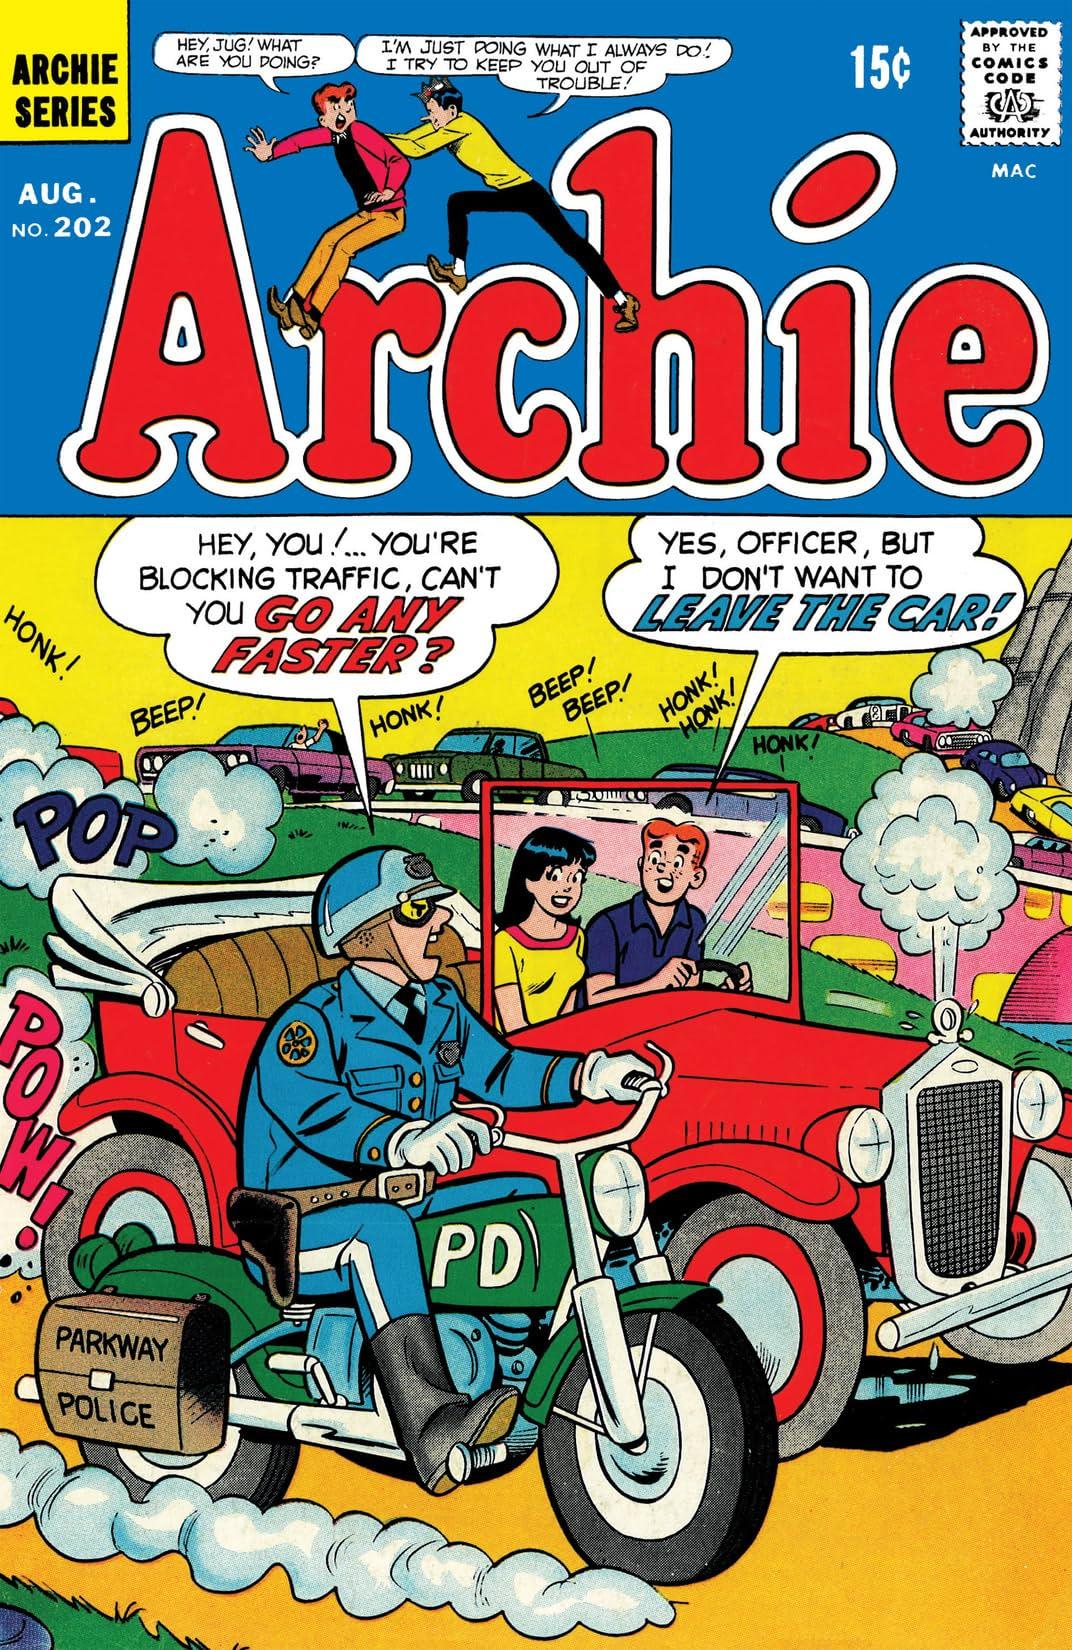 Archie #202